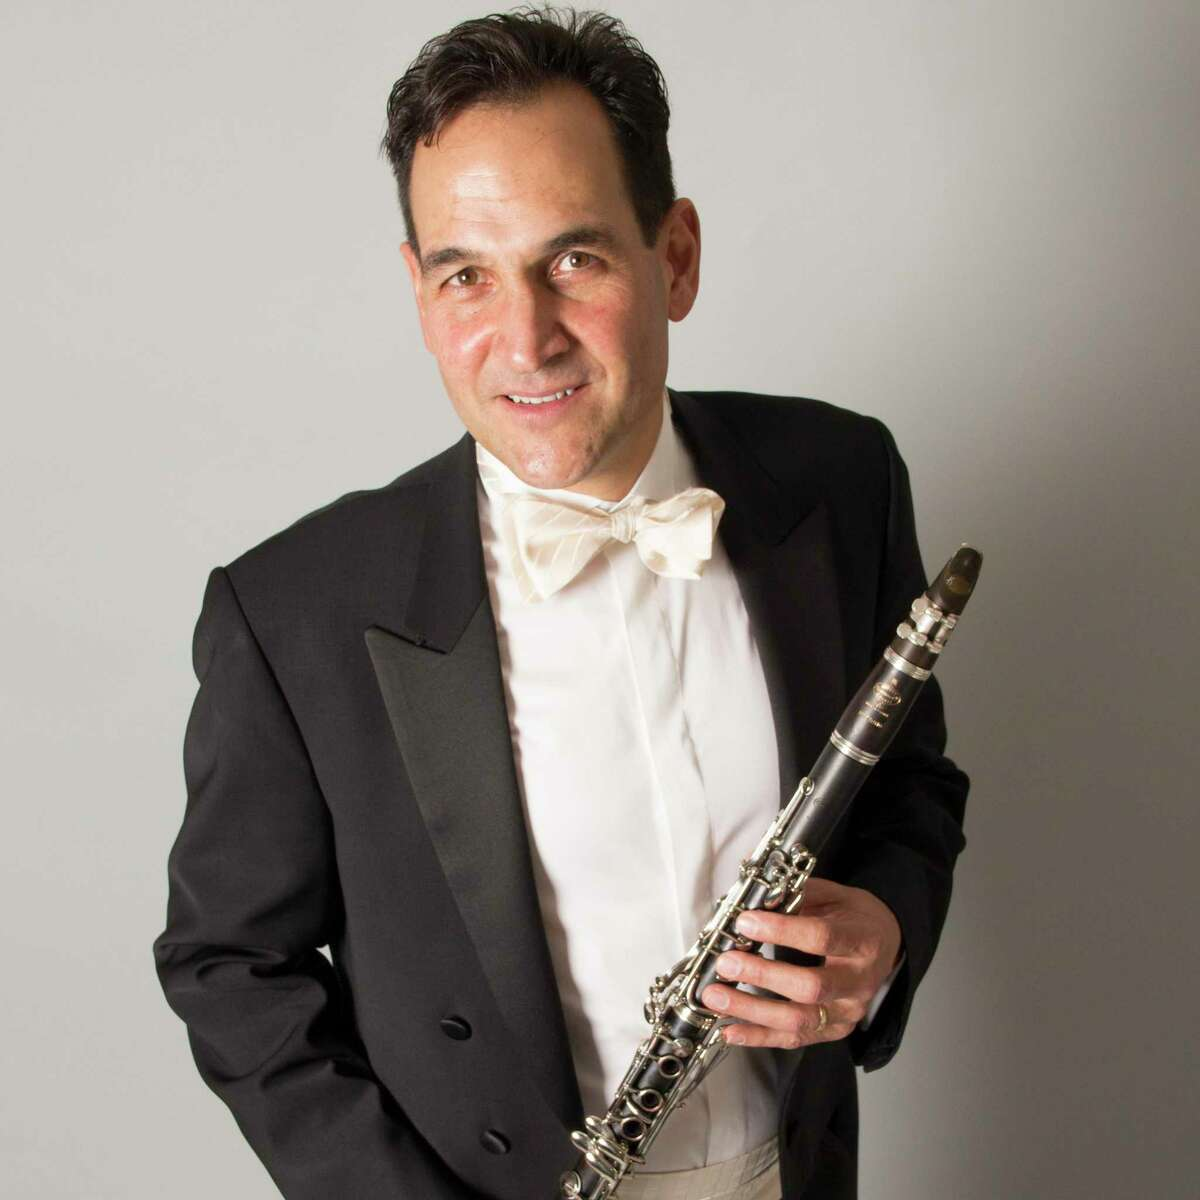 Mark Nuccio is principal clarinetist for the Houston Symphony.